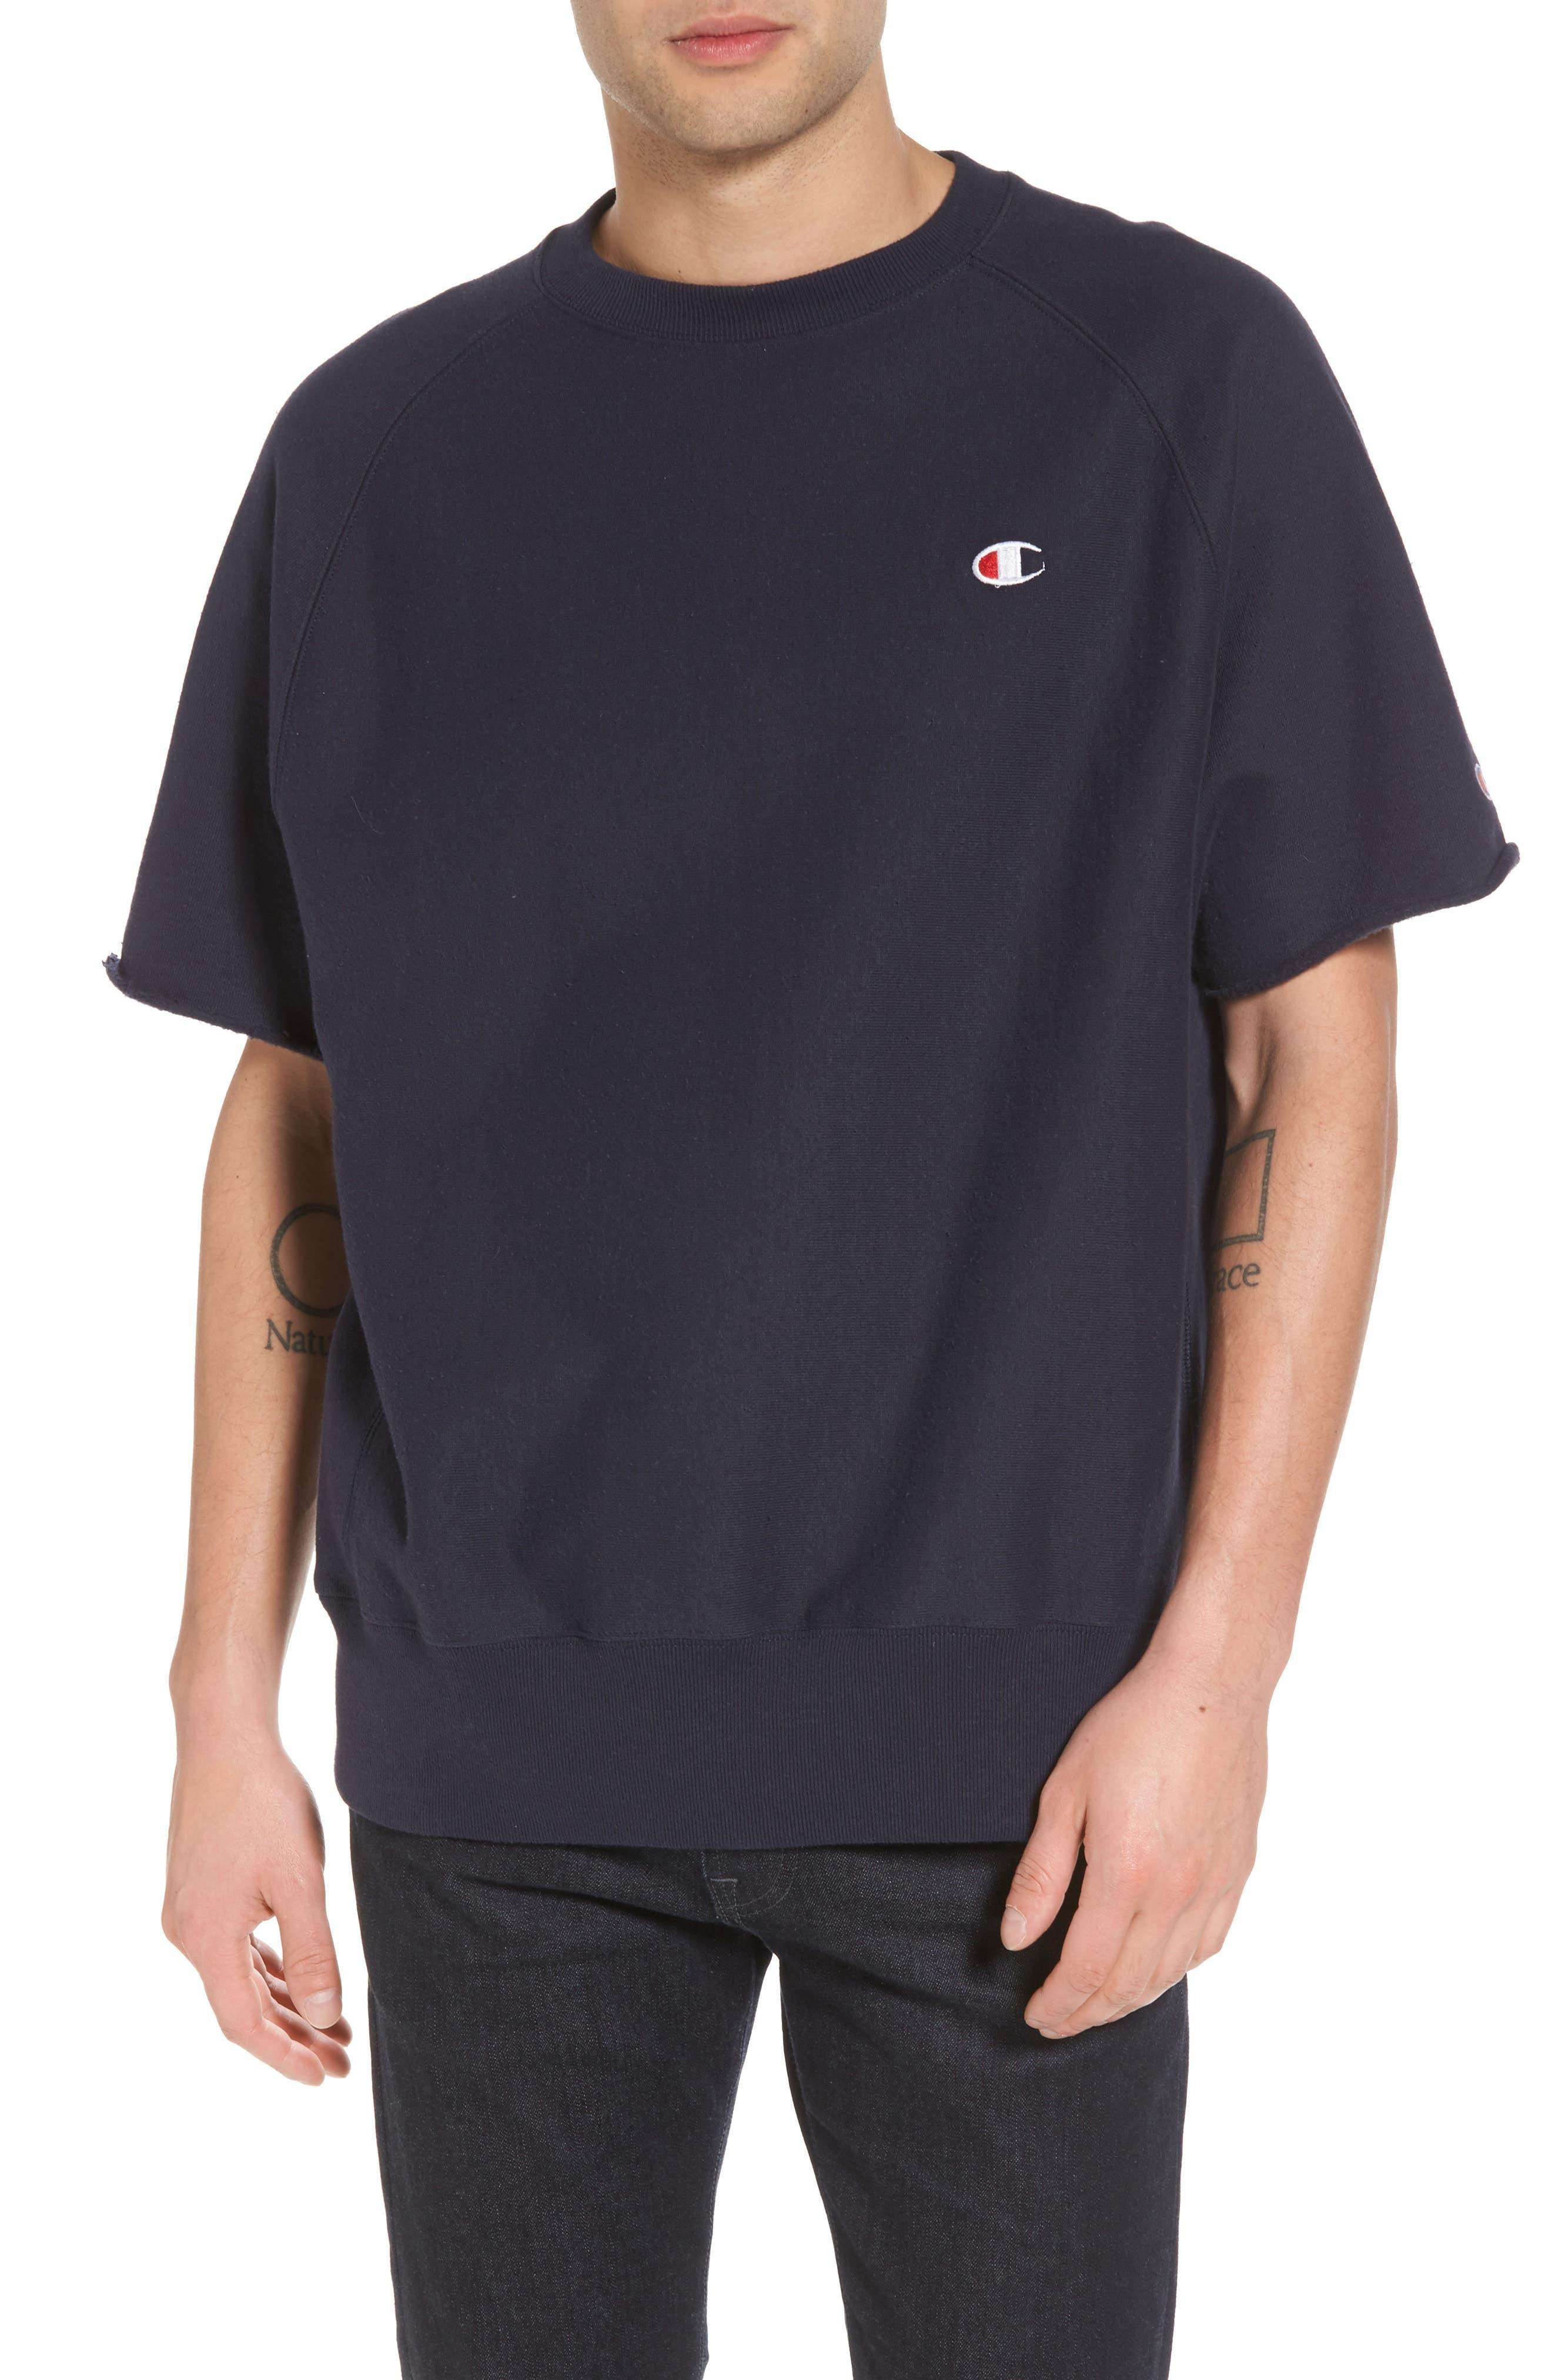 b53a5043490 Shop for Champion Reverse Weave Short Sleeve Sweatshirt online